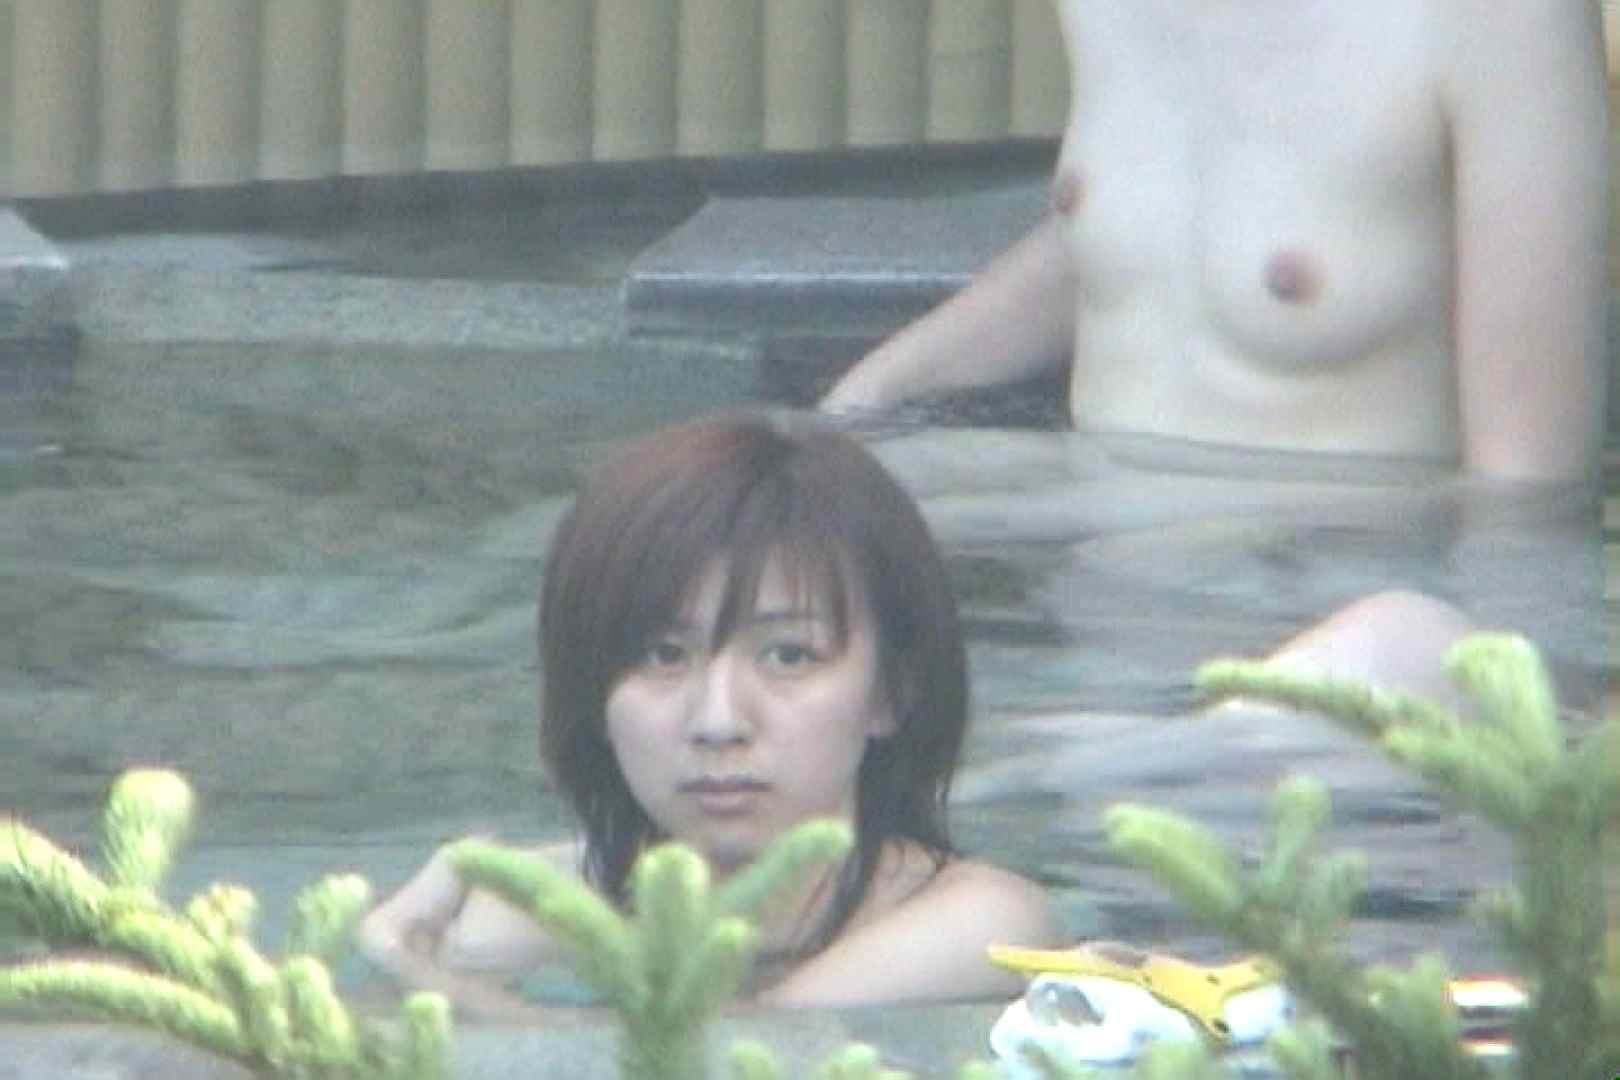 Aquaな露天風呂Vol.77【VIP限定】 美しいOLの裸体   露天風呂突入  96pic 73